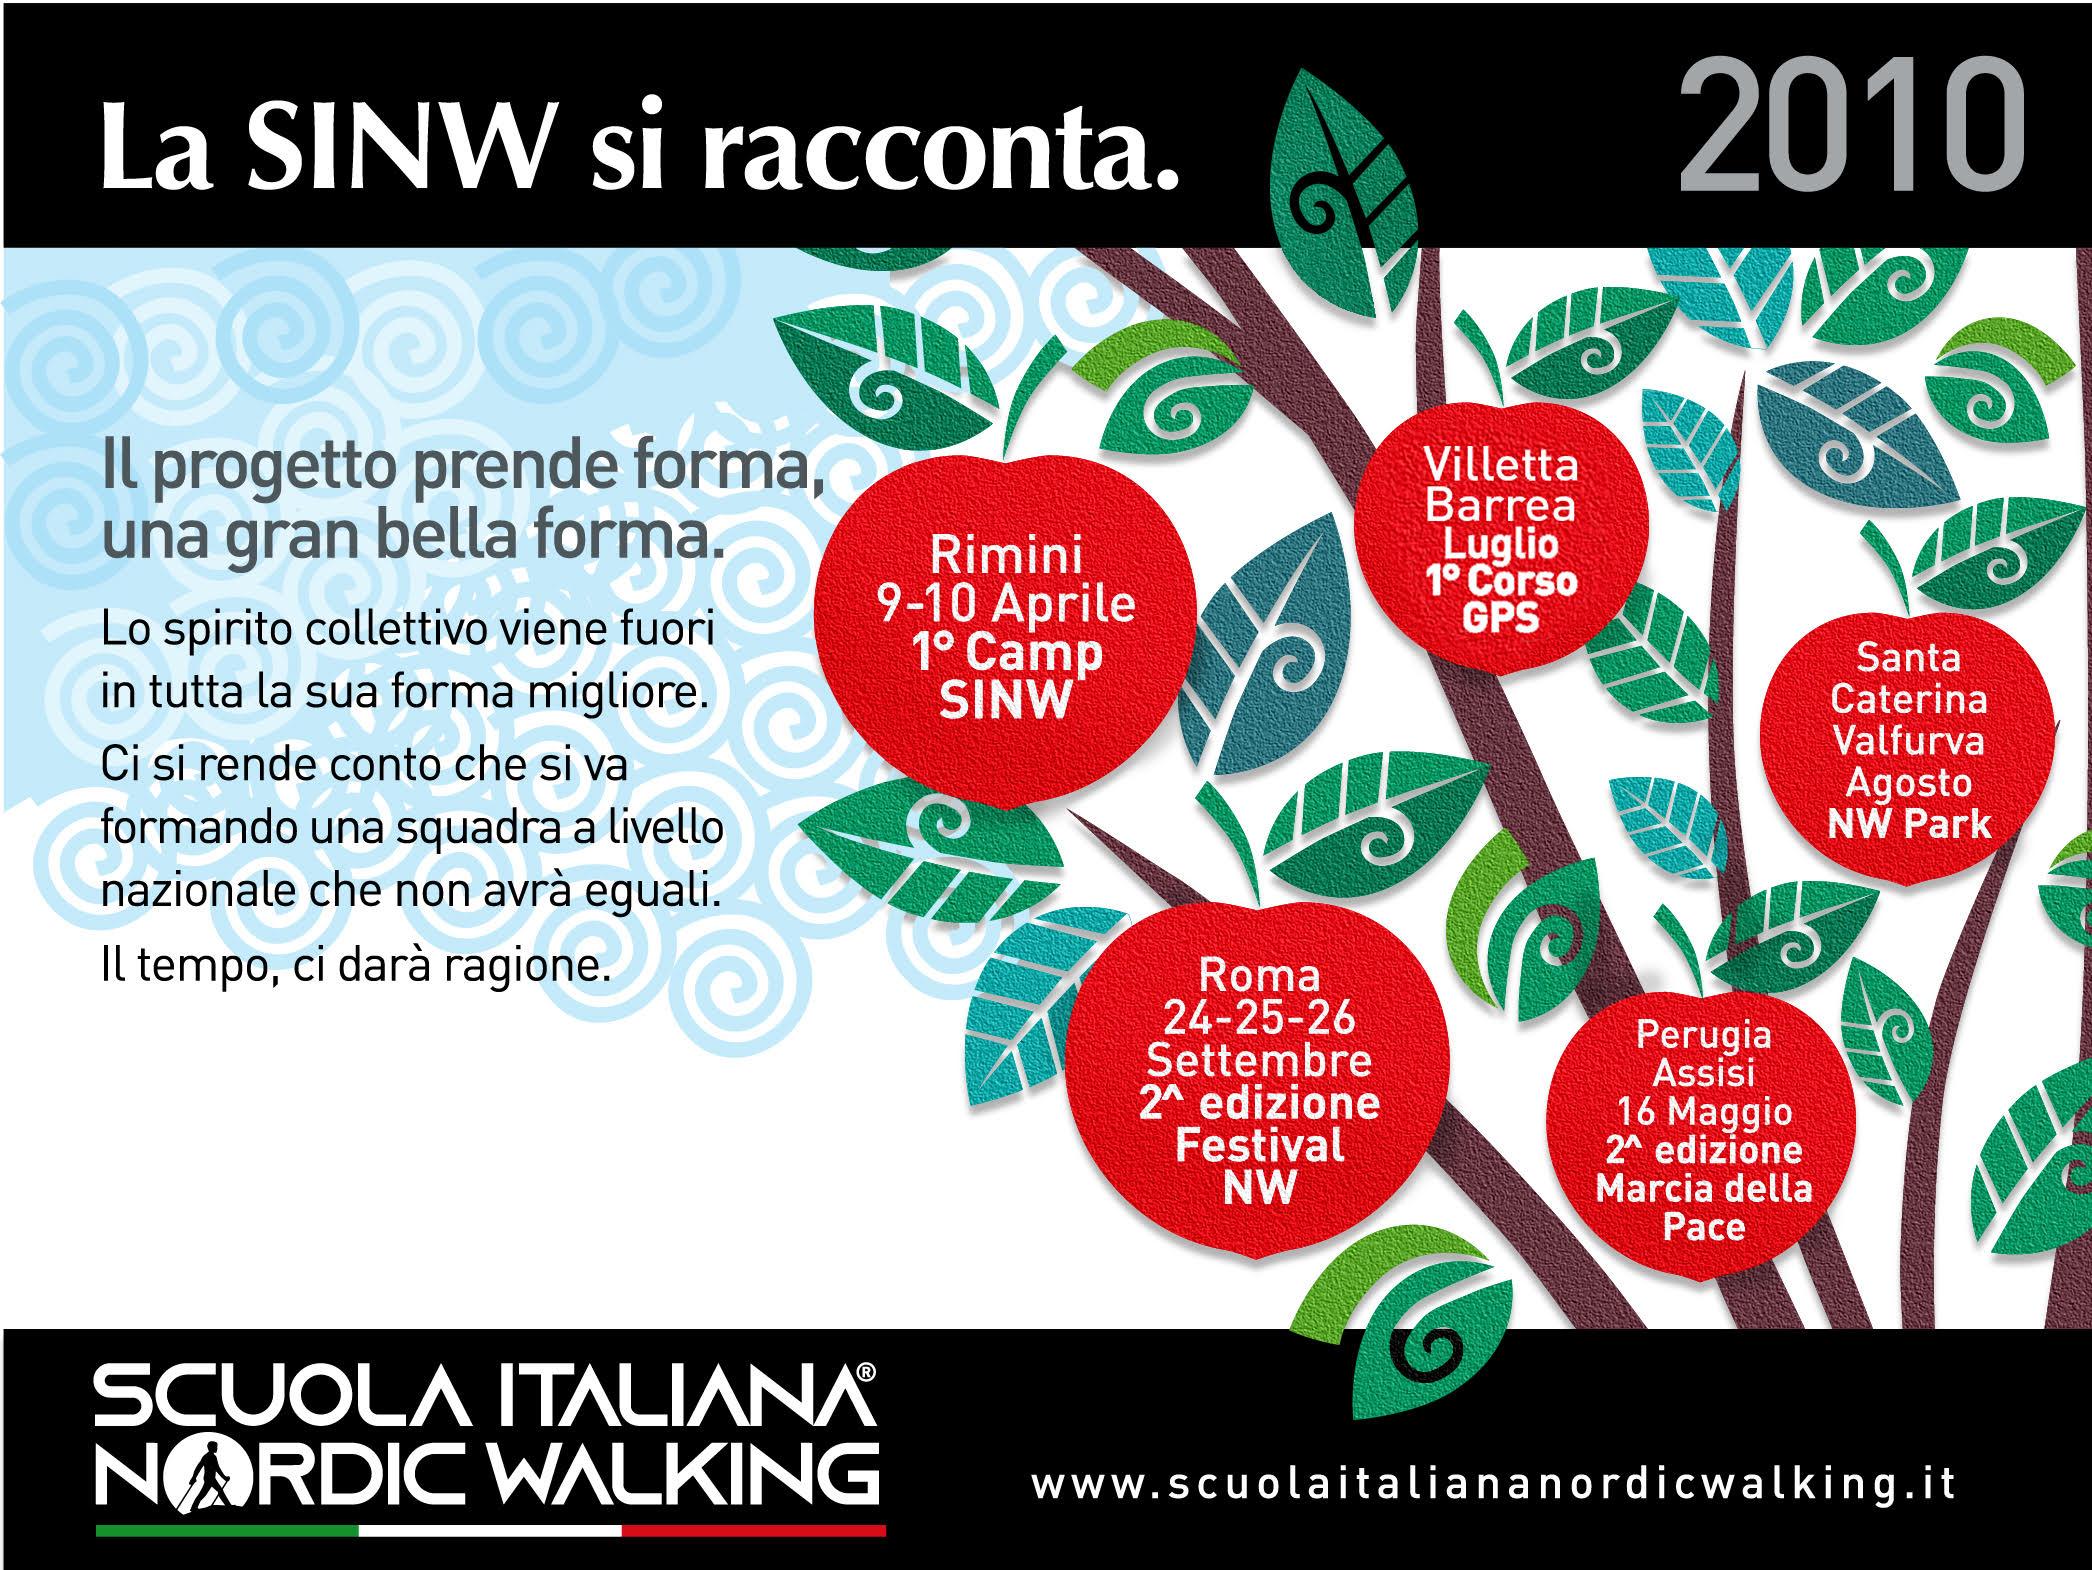 La SINW si racconta: 2010